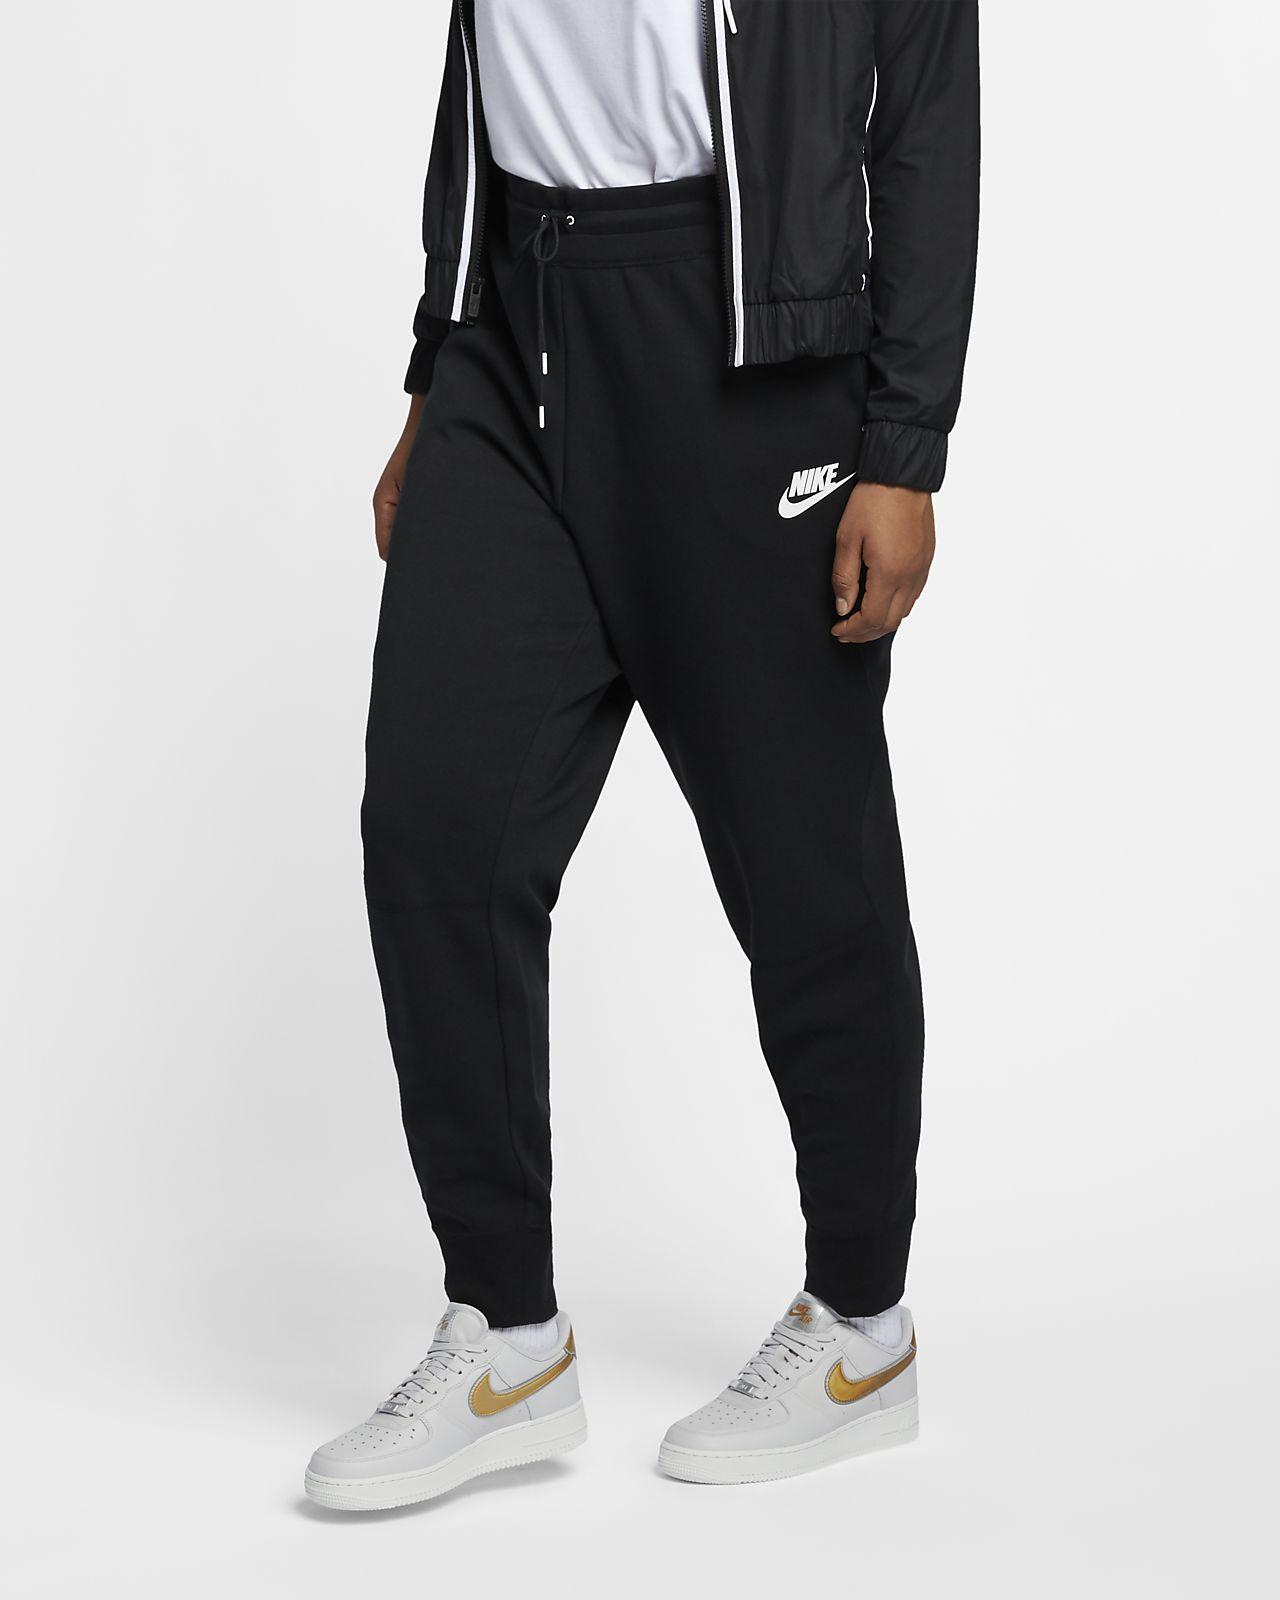 c7767990771 Nike Sportswear Tech Fleece Damesbroek (grote maten). Nike.com NL